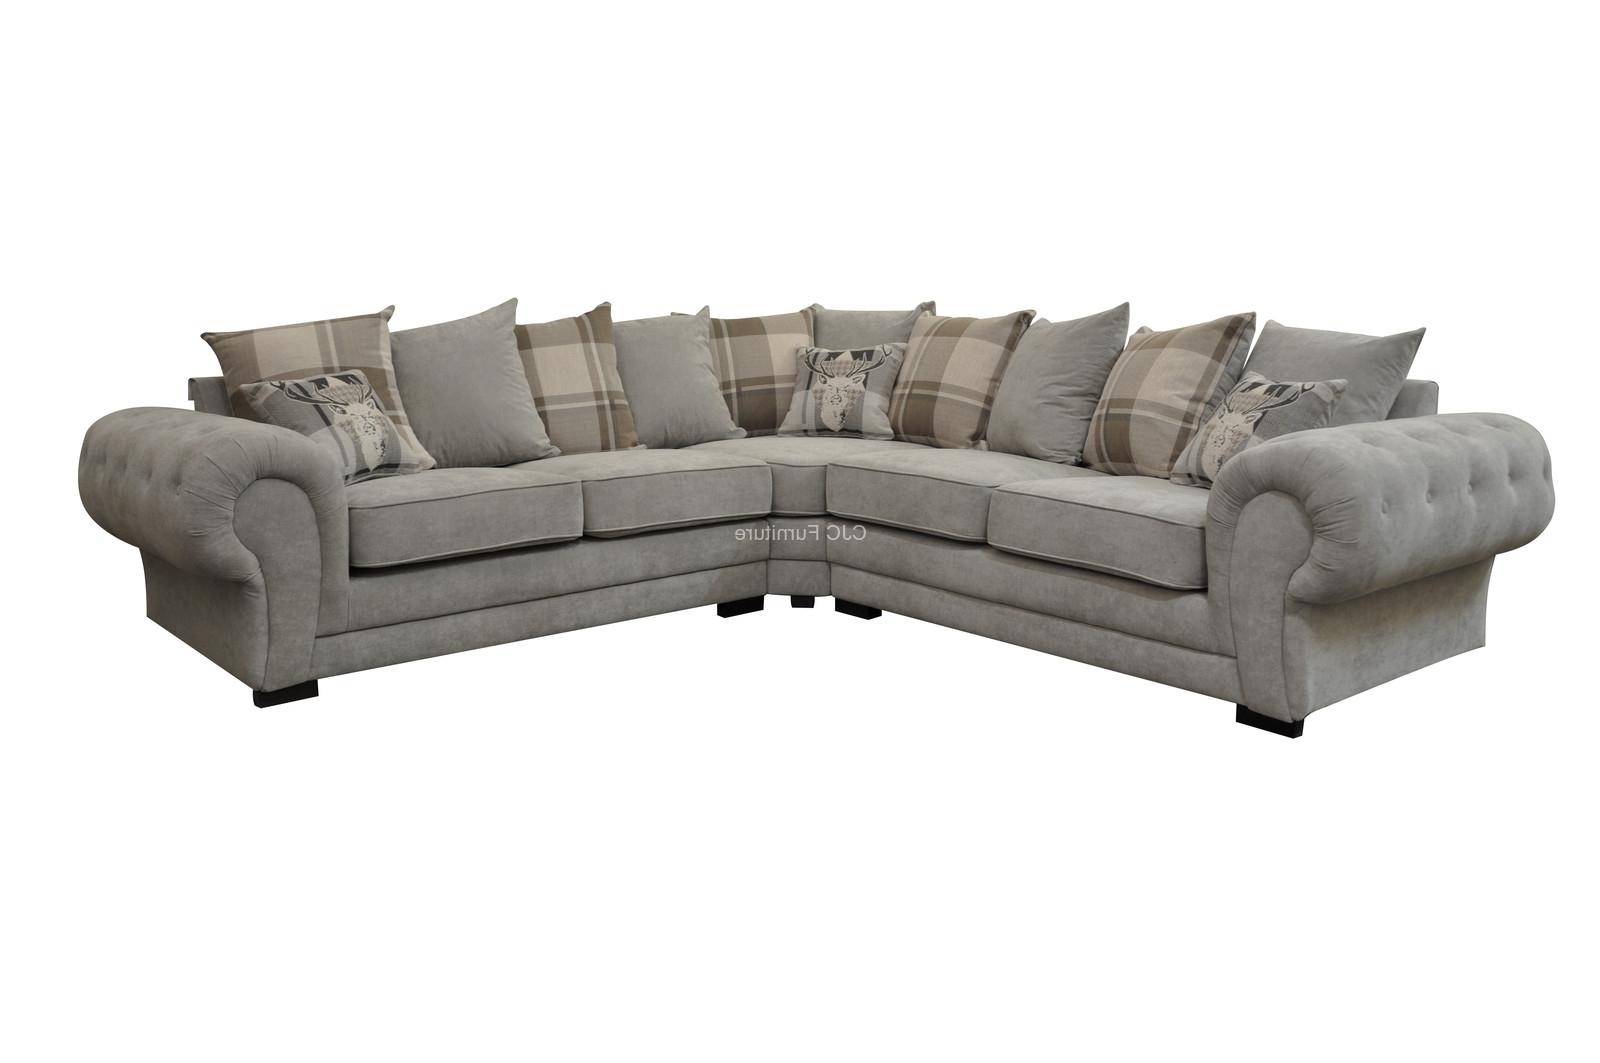 Most Recent Birmingham Furniture – Cjcfurniture.co (View 11 of 15)